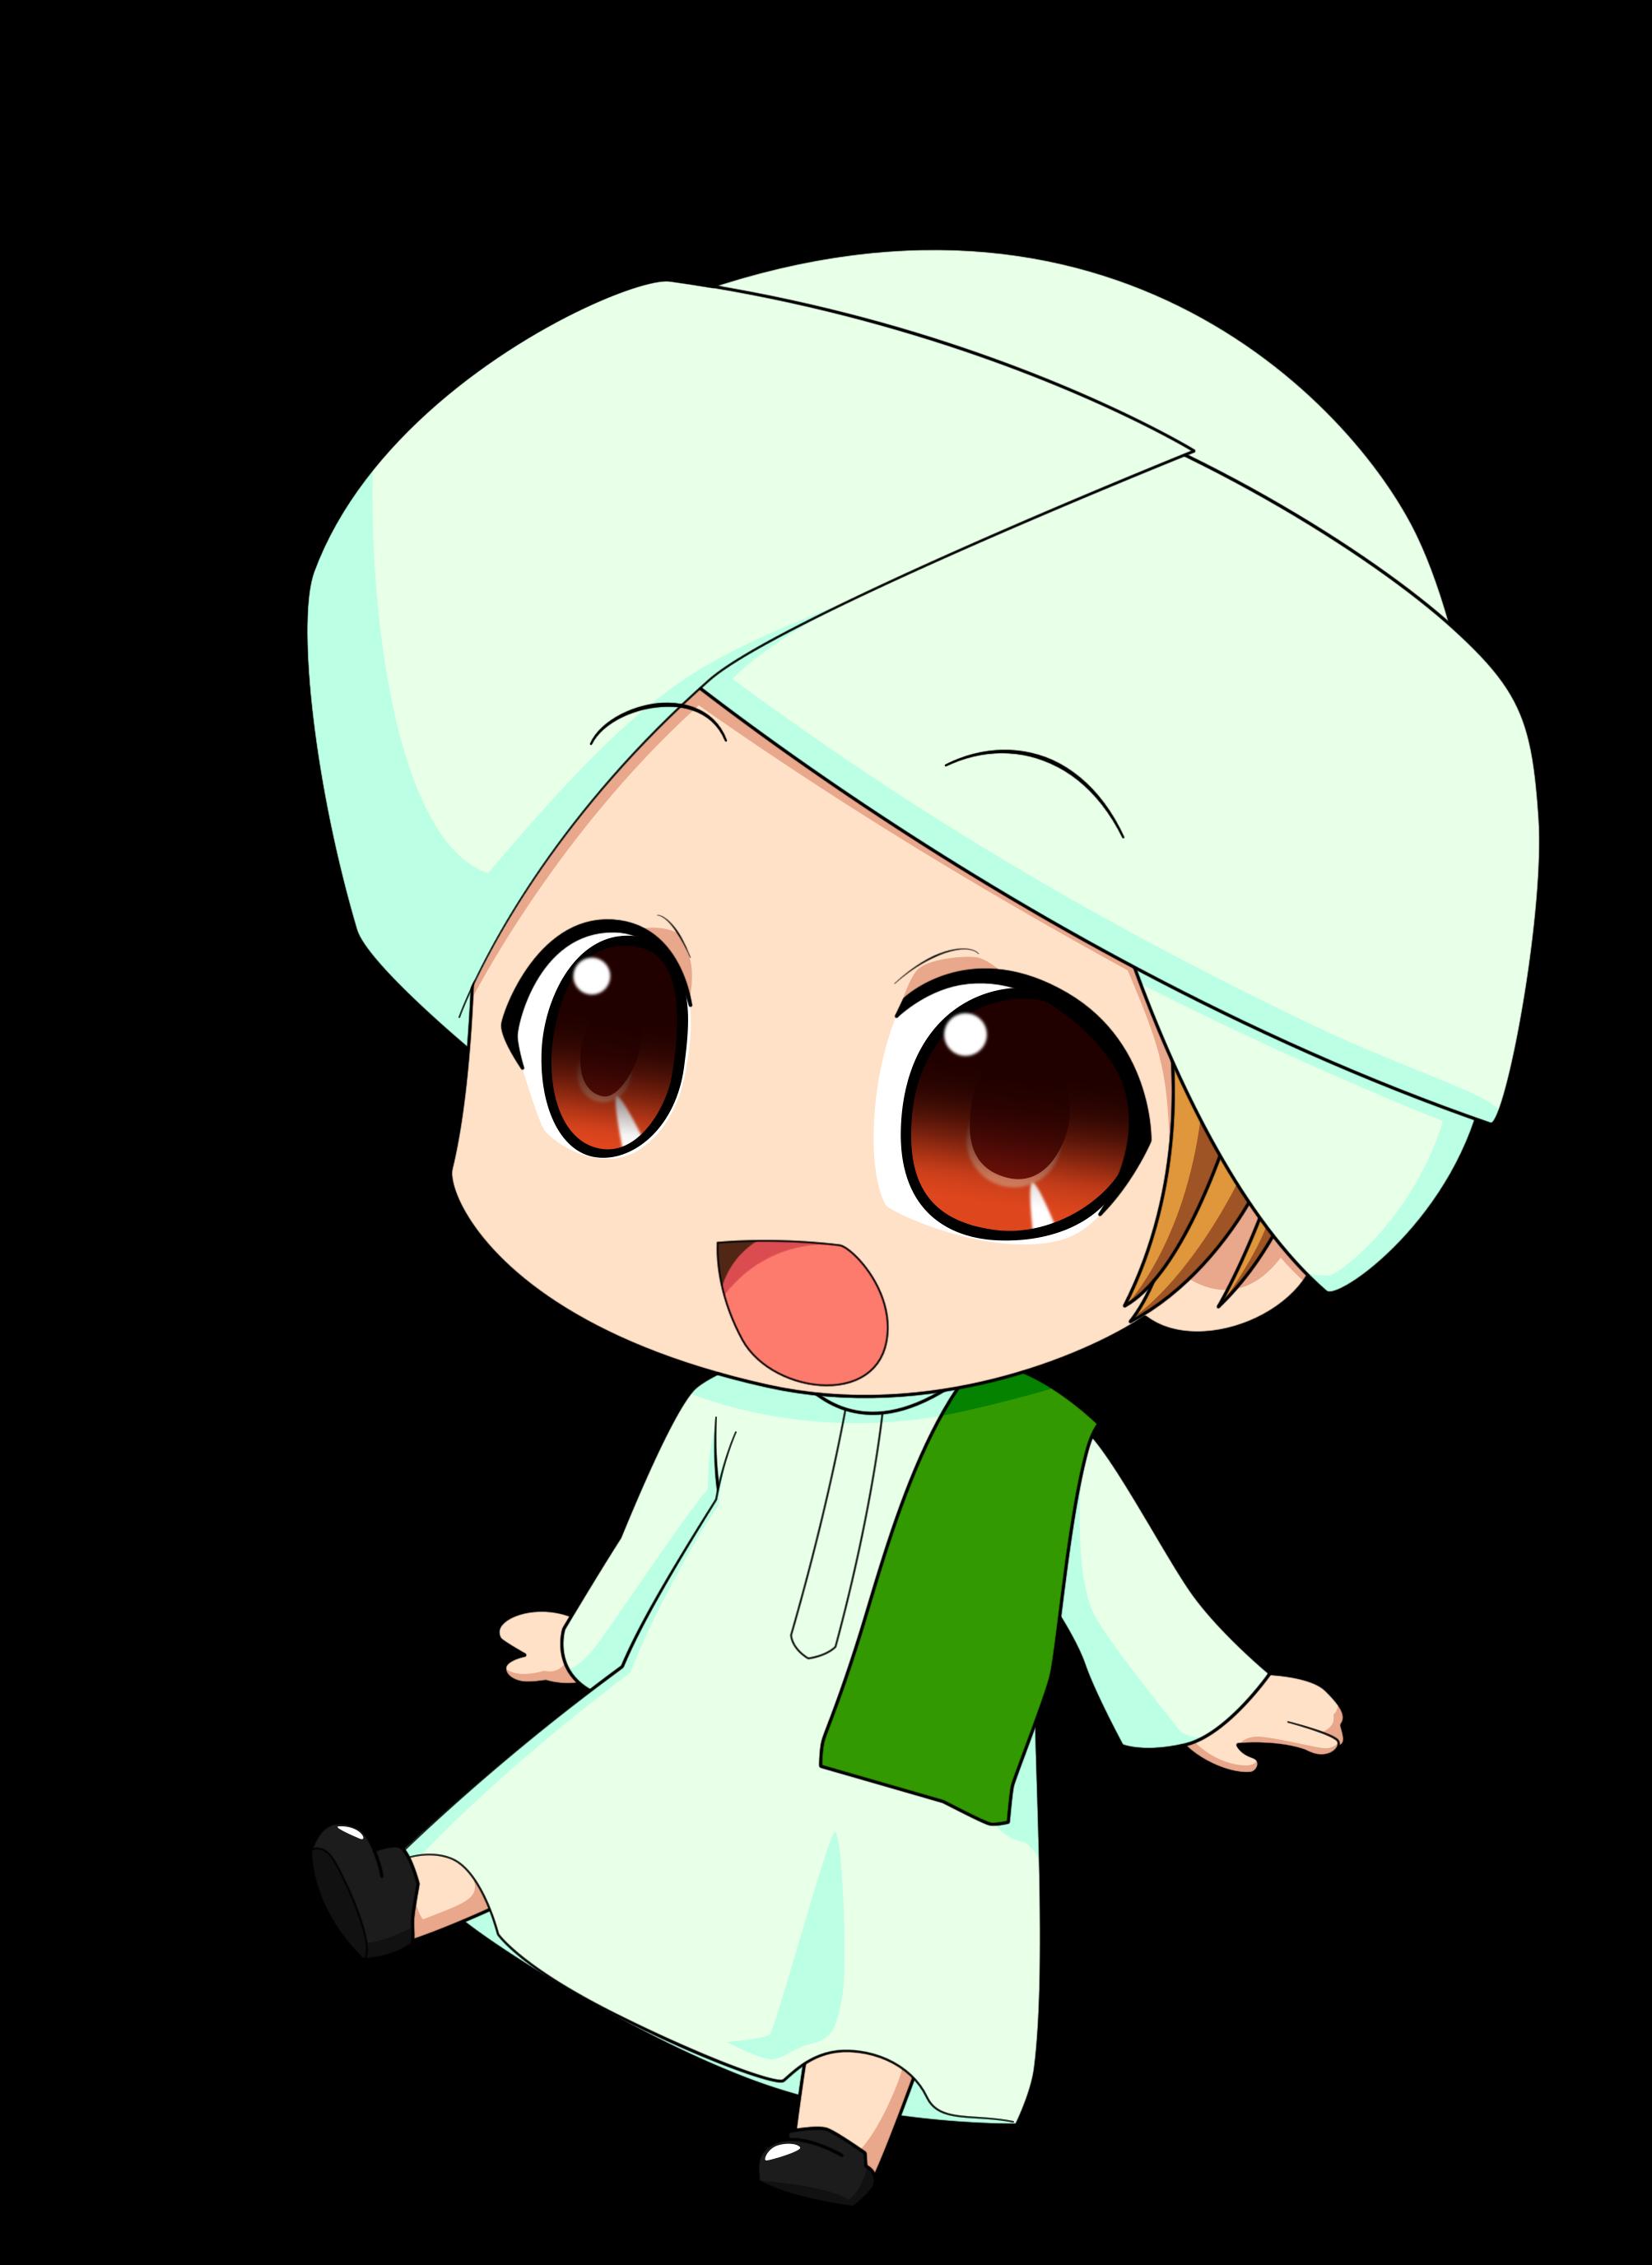 Gambar Kartun Muslimah Chibi Top Gambar